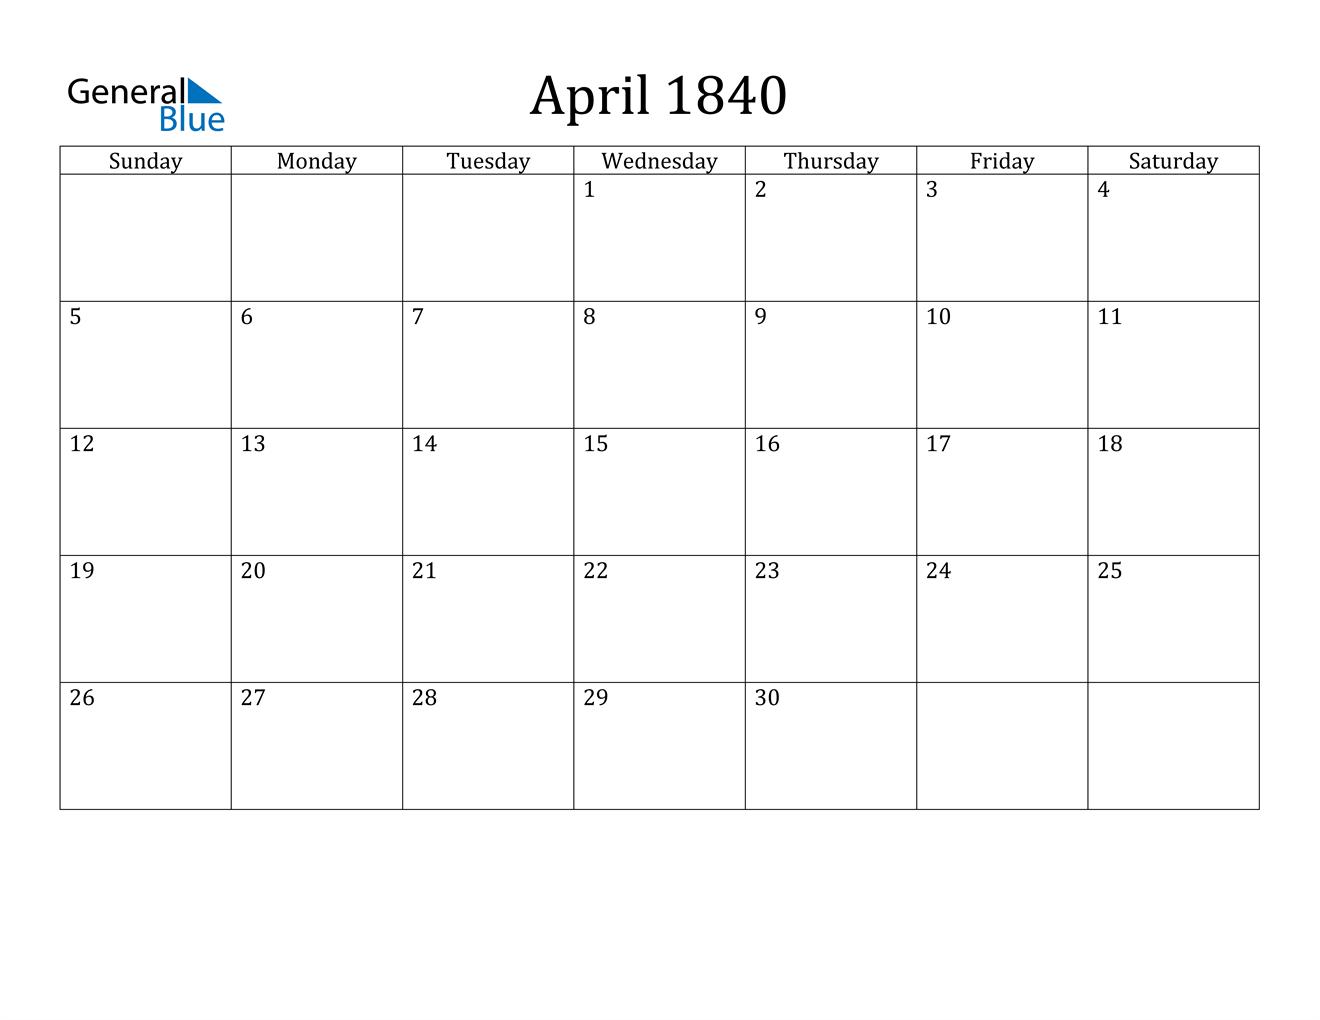 Image of April 1840 Calendar